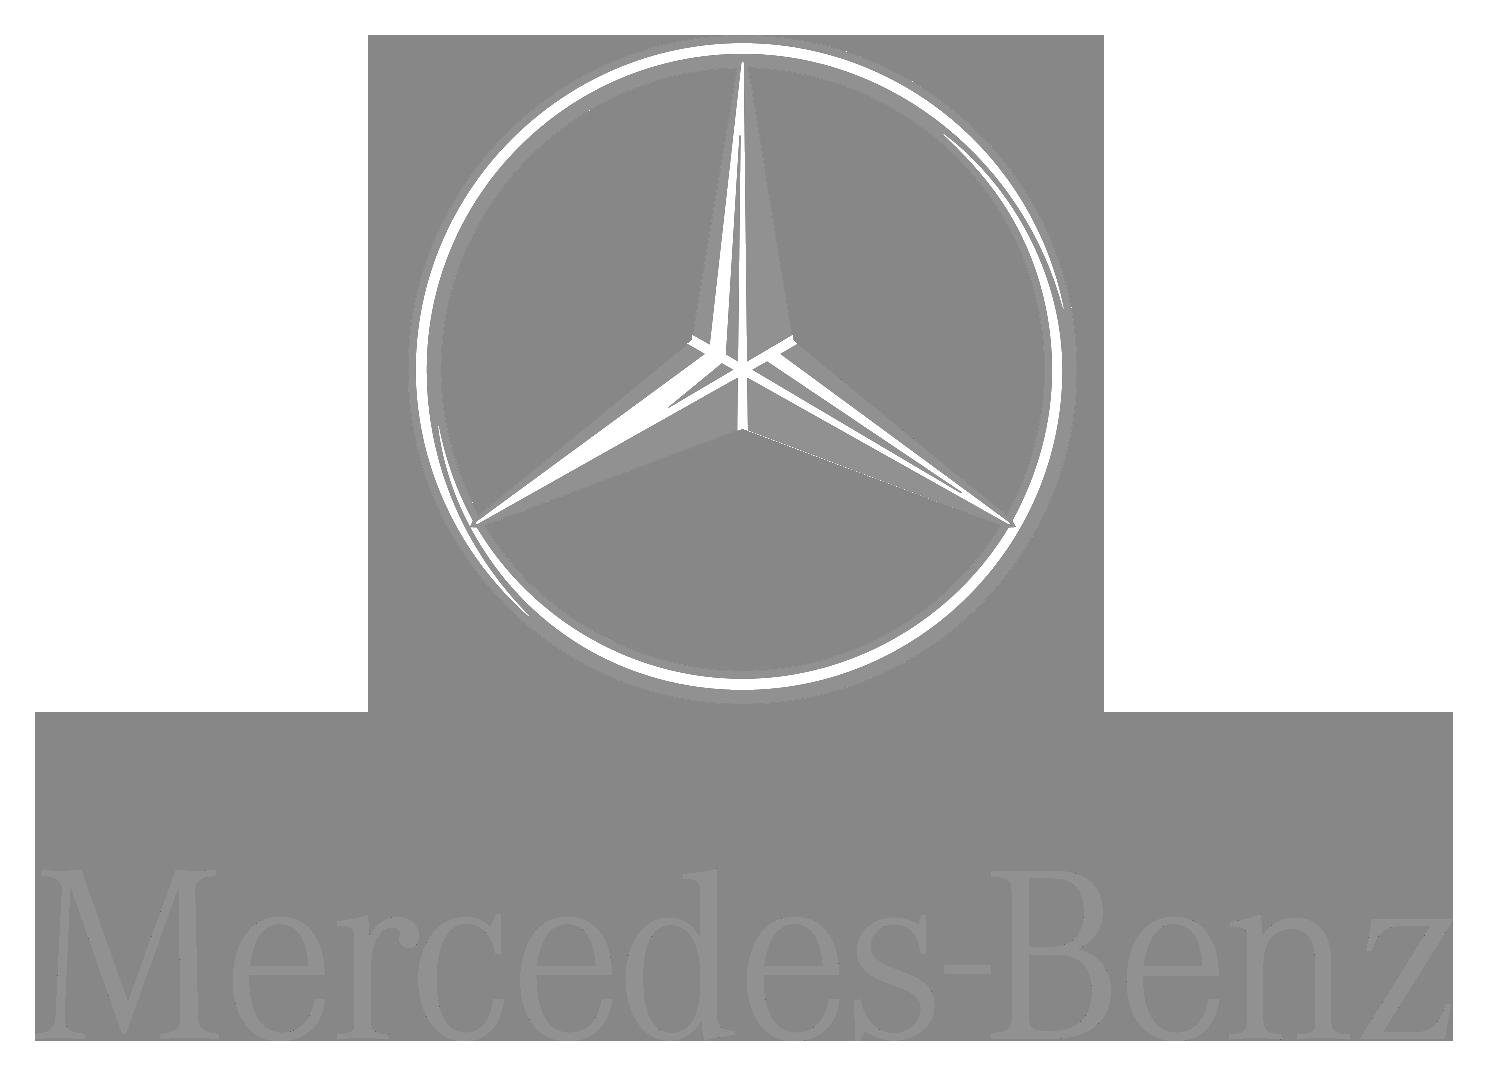 Referenz Mercedes-Benz